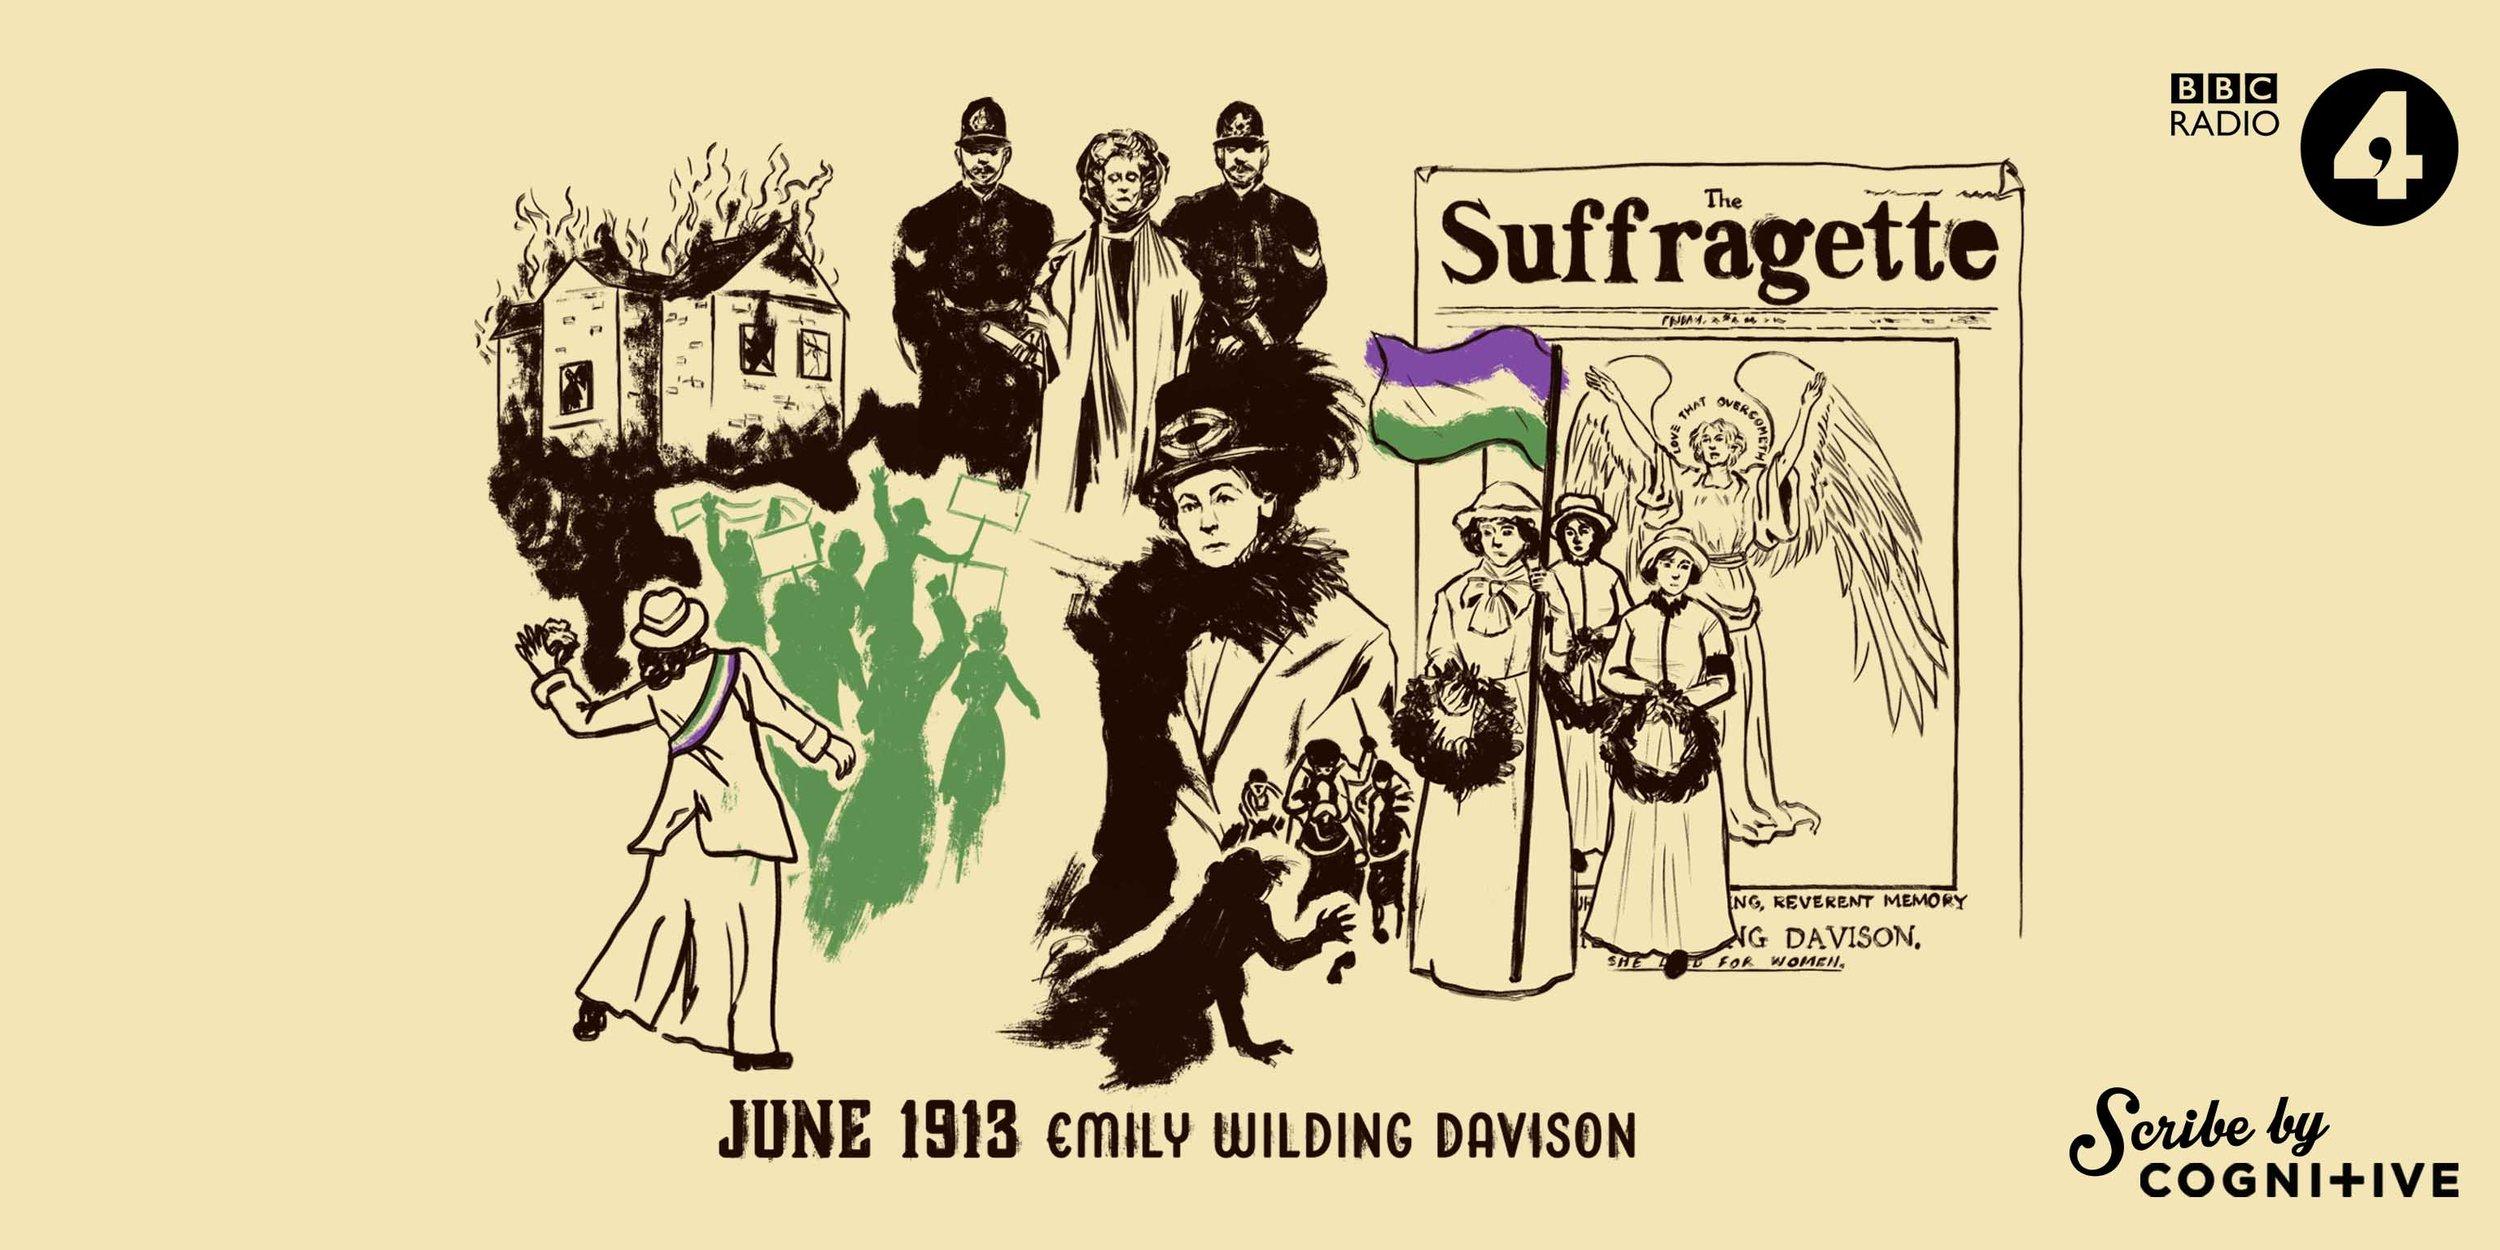 Cognitive_Suffragettes_Animation 05